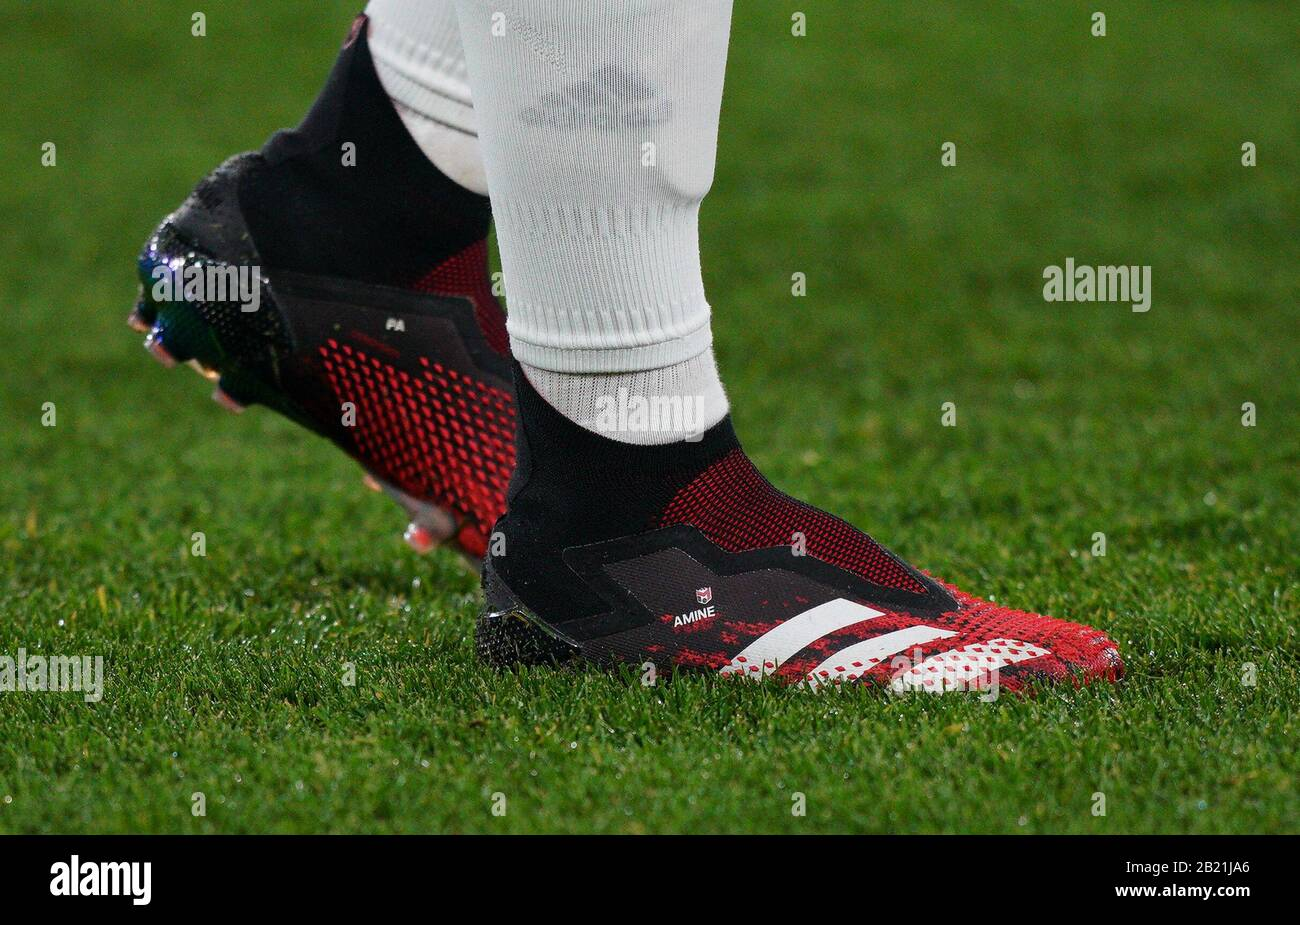 London, UK. 27th Feb, 2020. The Adidas football boots of Mesut ...